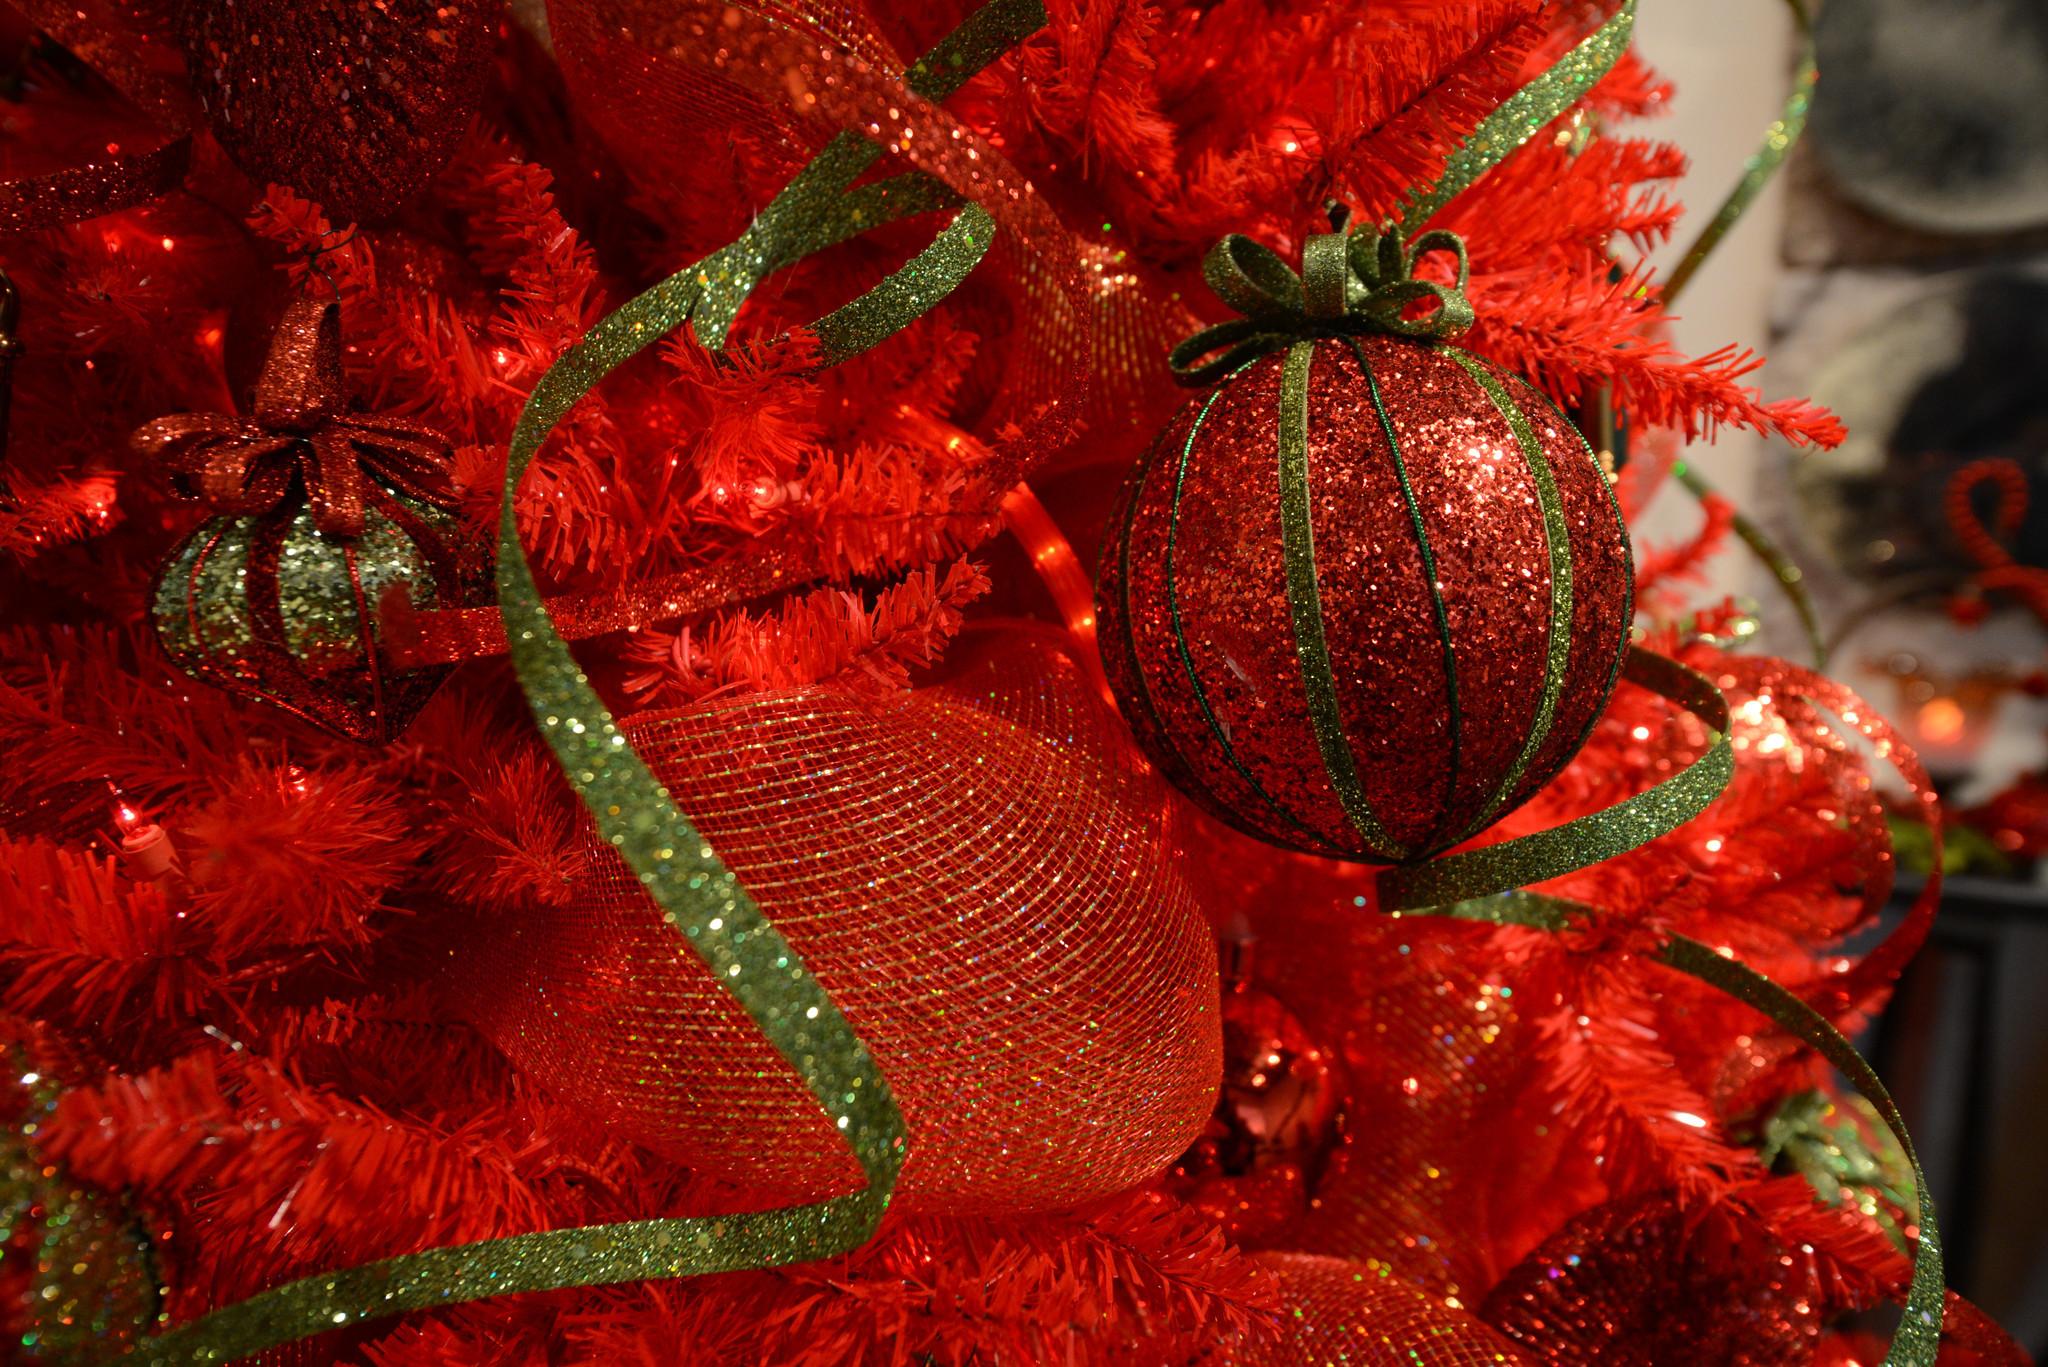 Festival de rboles navide os el sentinel - Fotos arboles navidenos ...